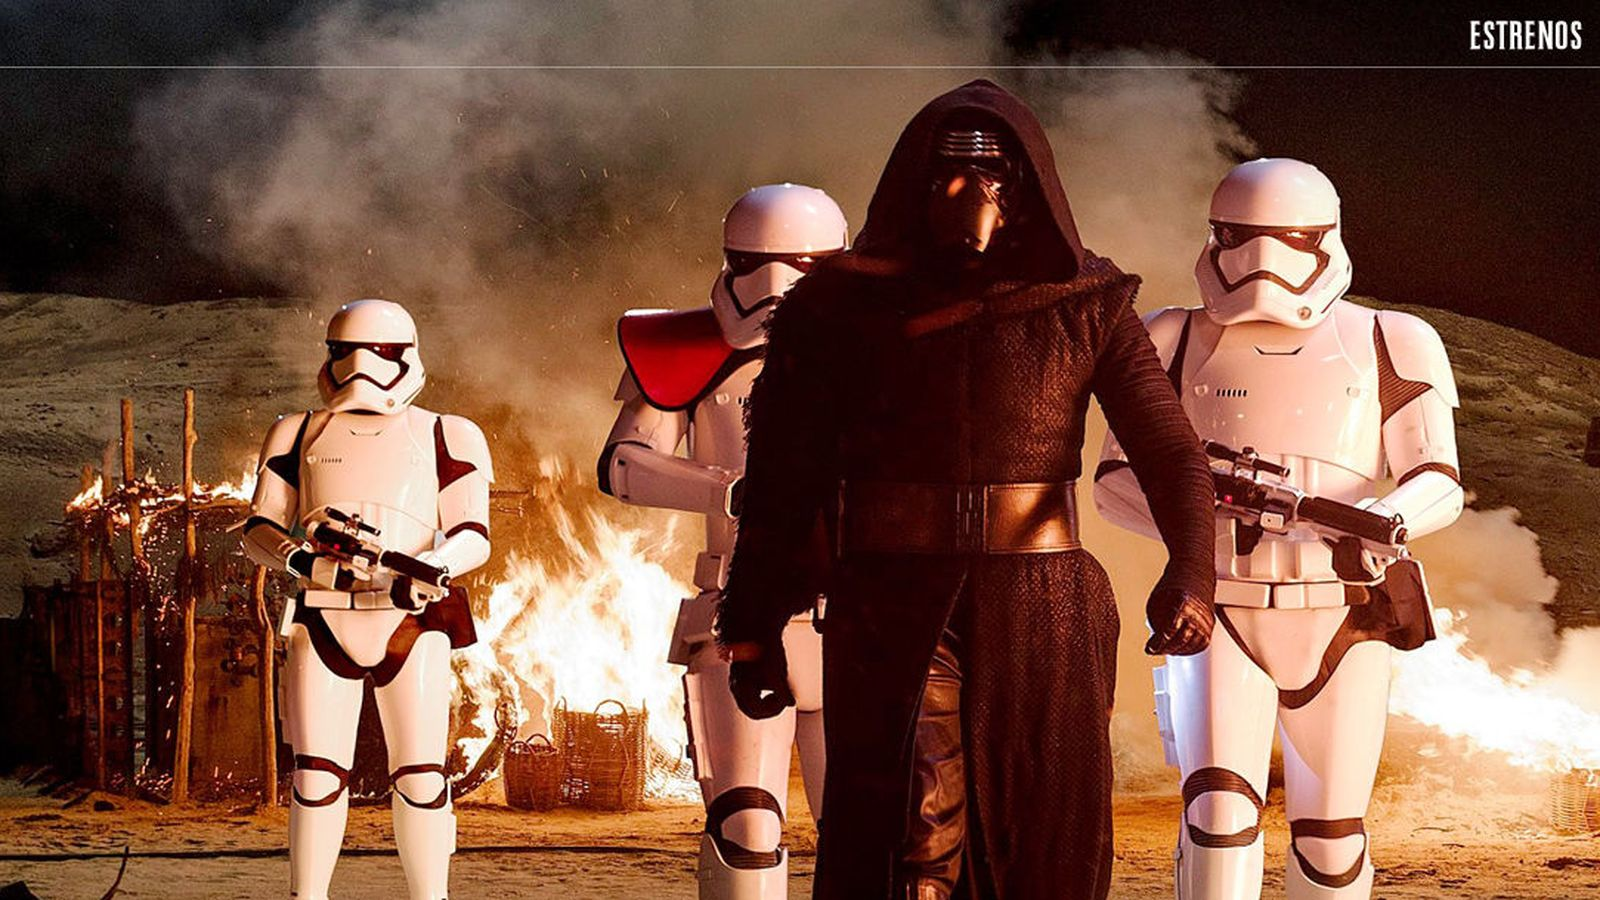 Foto: Fotograma de 'Star Wars: El despertar de la fuerza' (Disney)